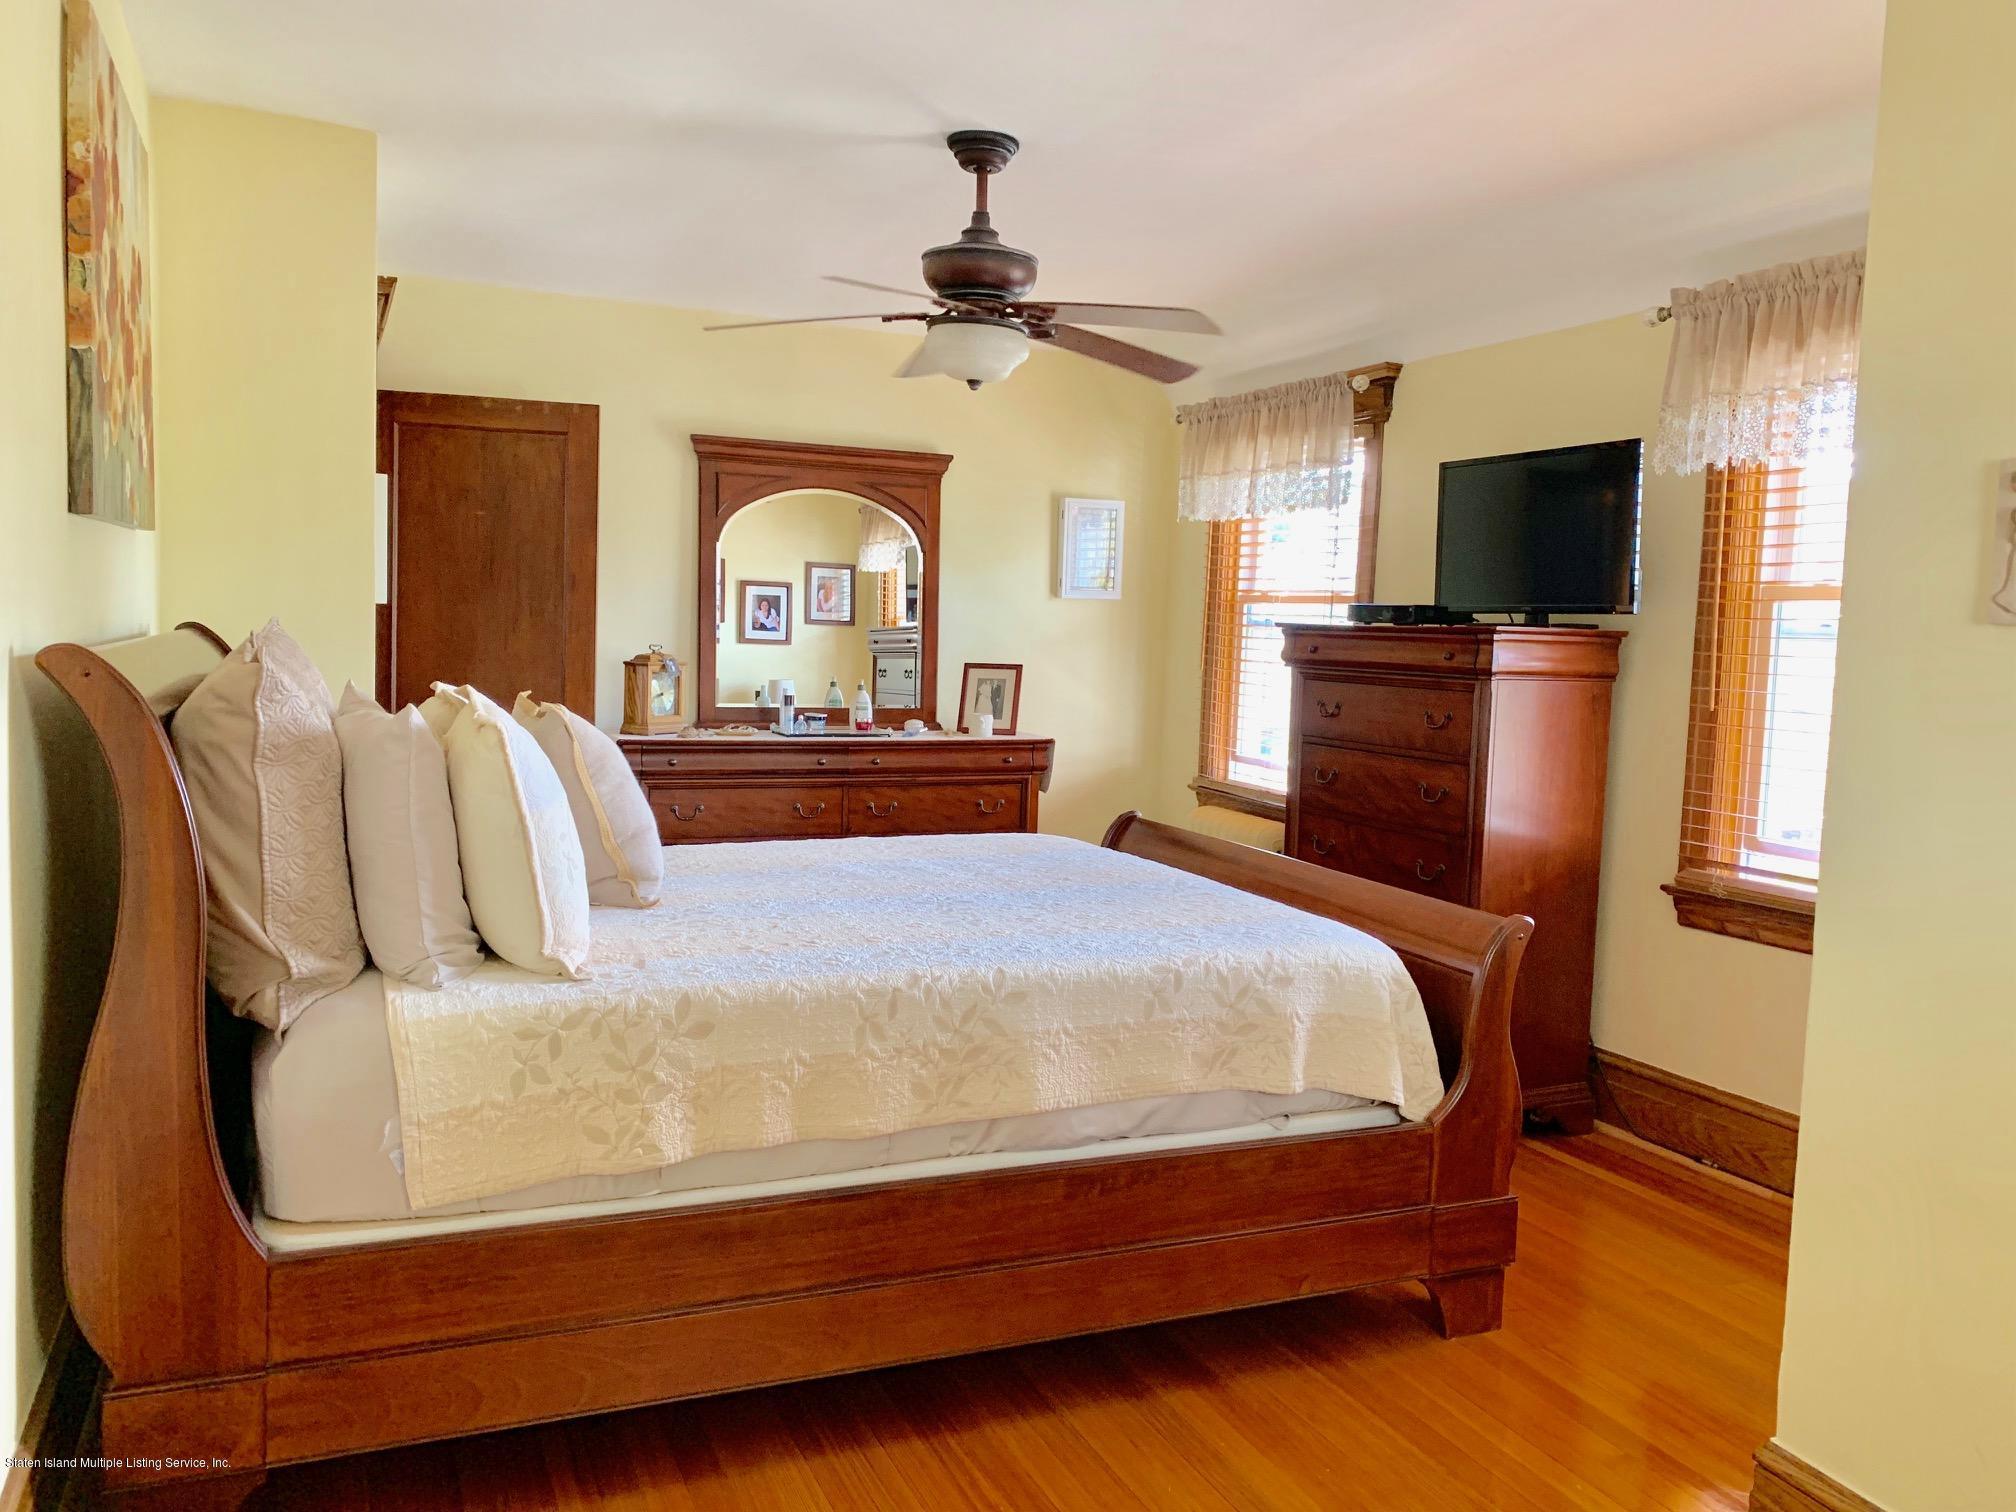 Single Family - Detached 195 Fairview Avenue  Staten Island, NY 10314, MLS-1132423-25